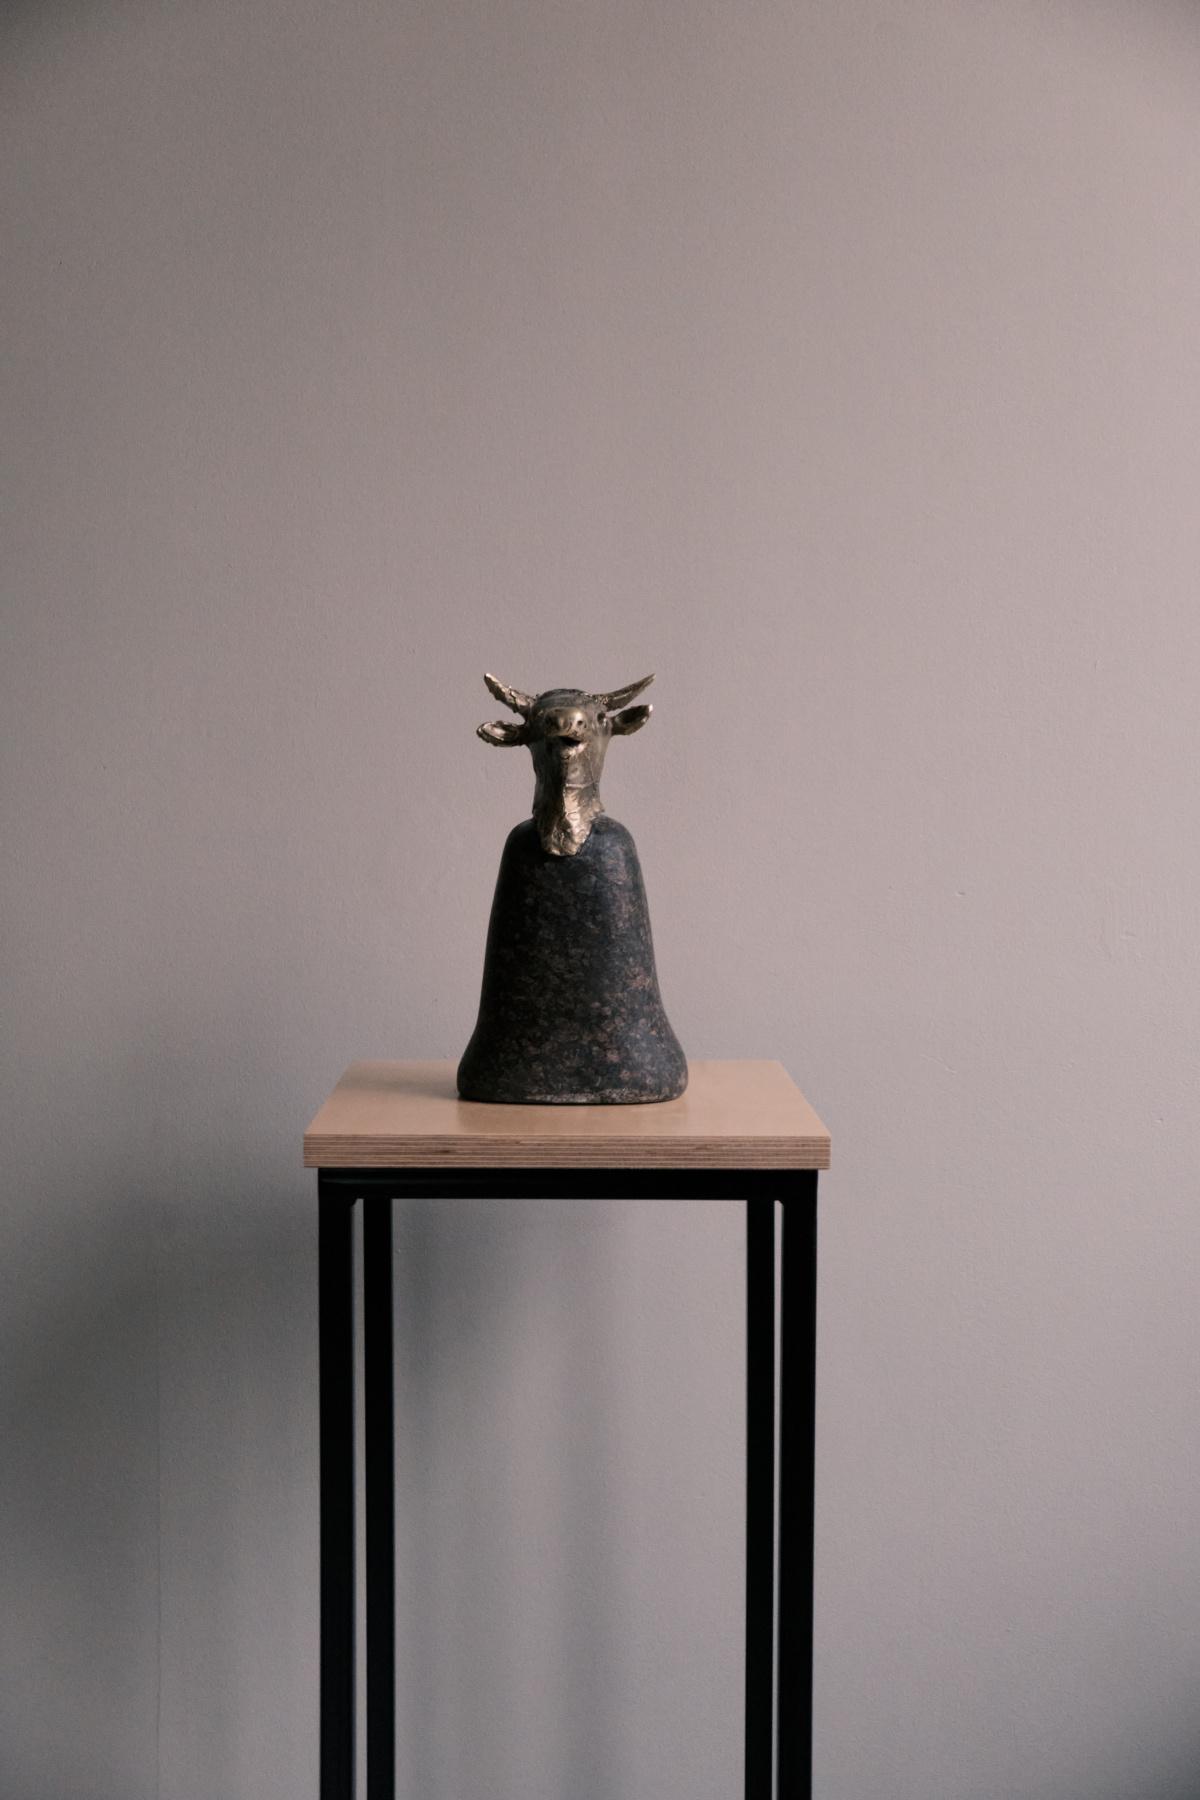 Marina Lvovna Spivak. Bull head